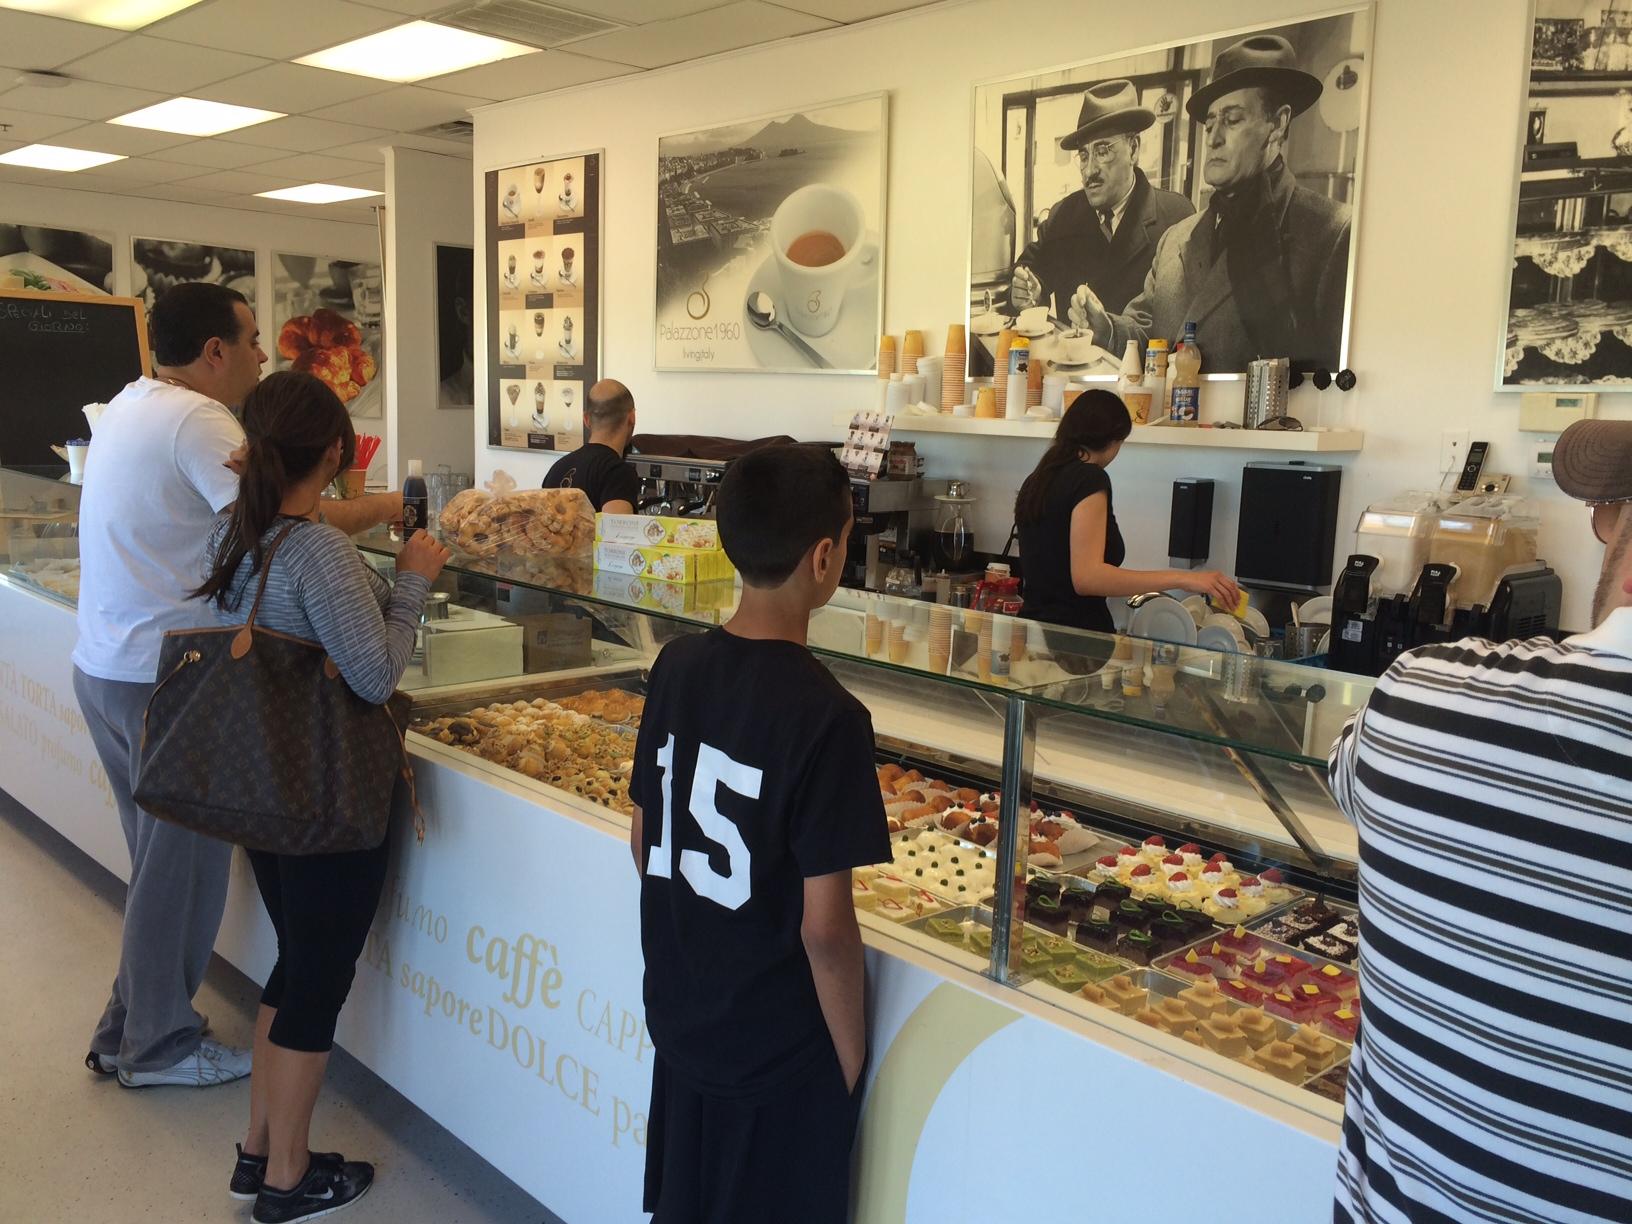 Palazzone Cafe 6/7/15